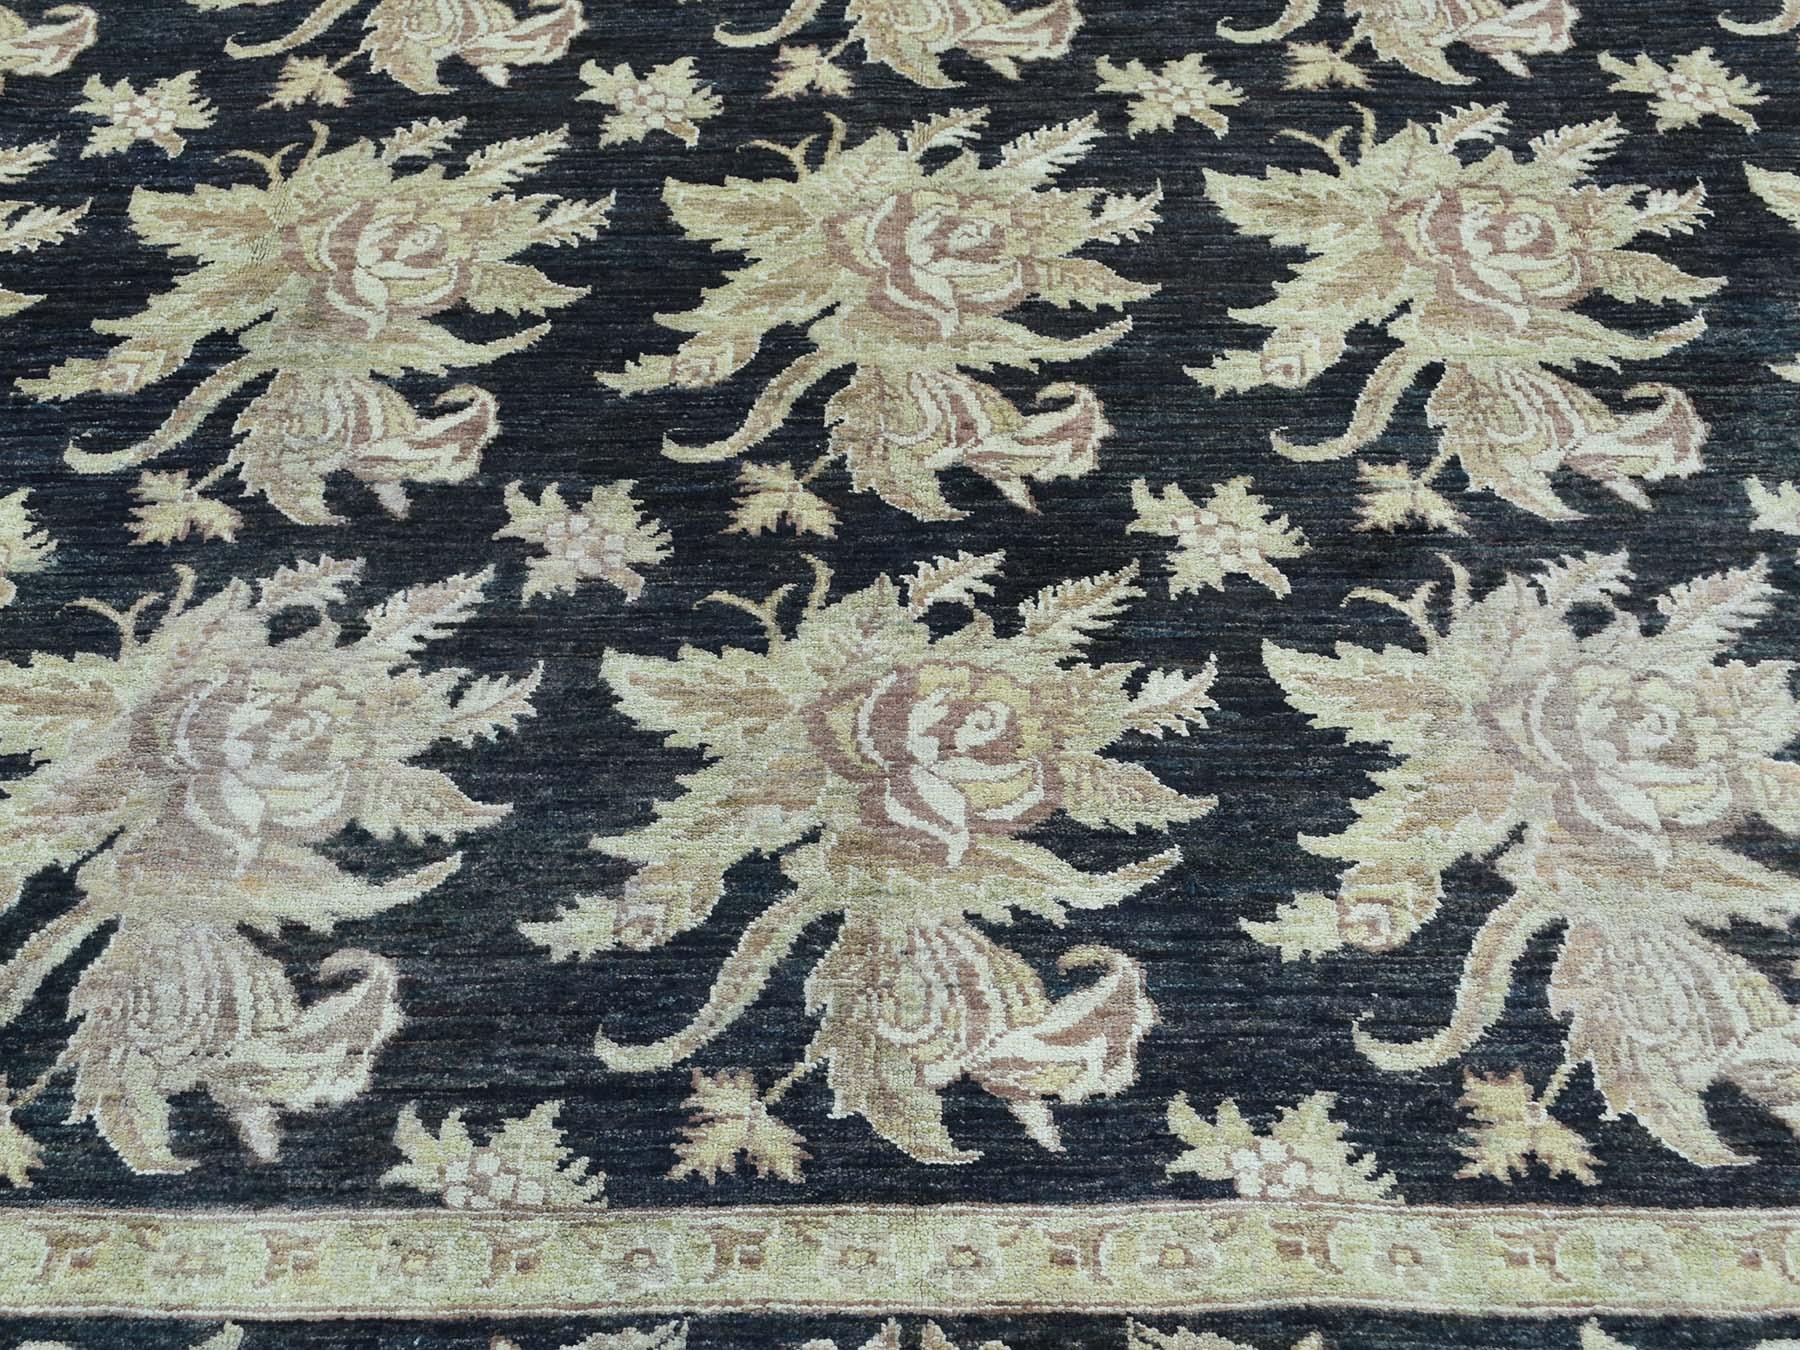 9-1 x12-4  Dense Weave Peshawar With Flower Design Hand-Knotted Rug